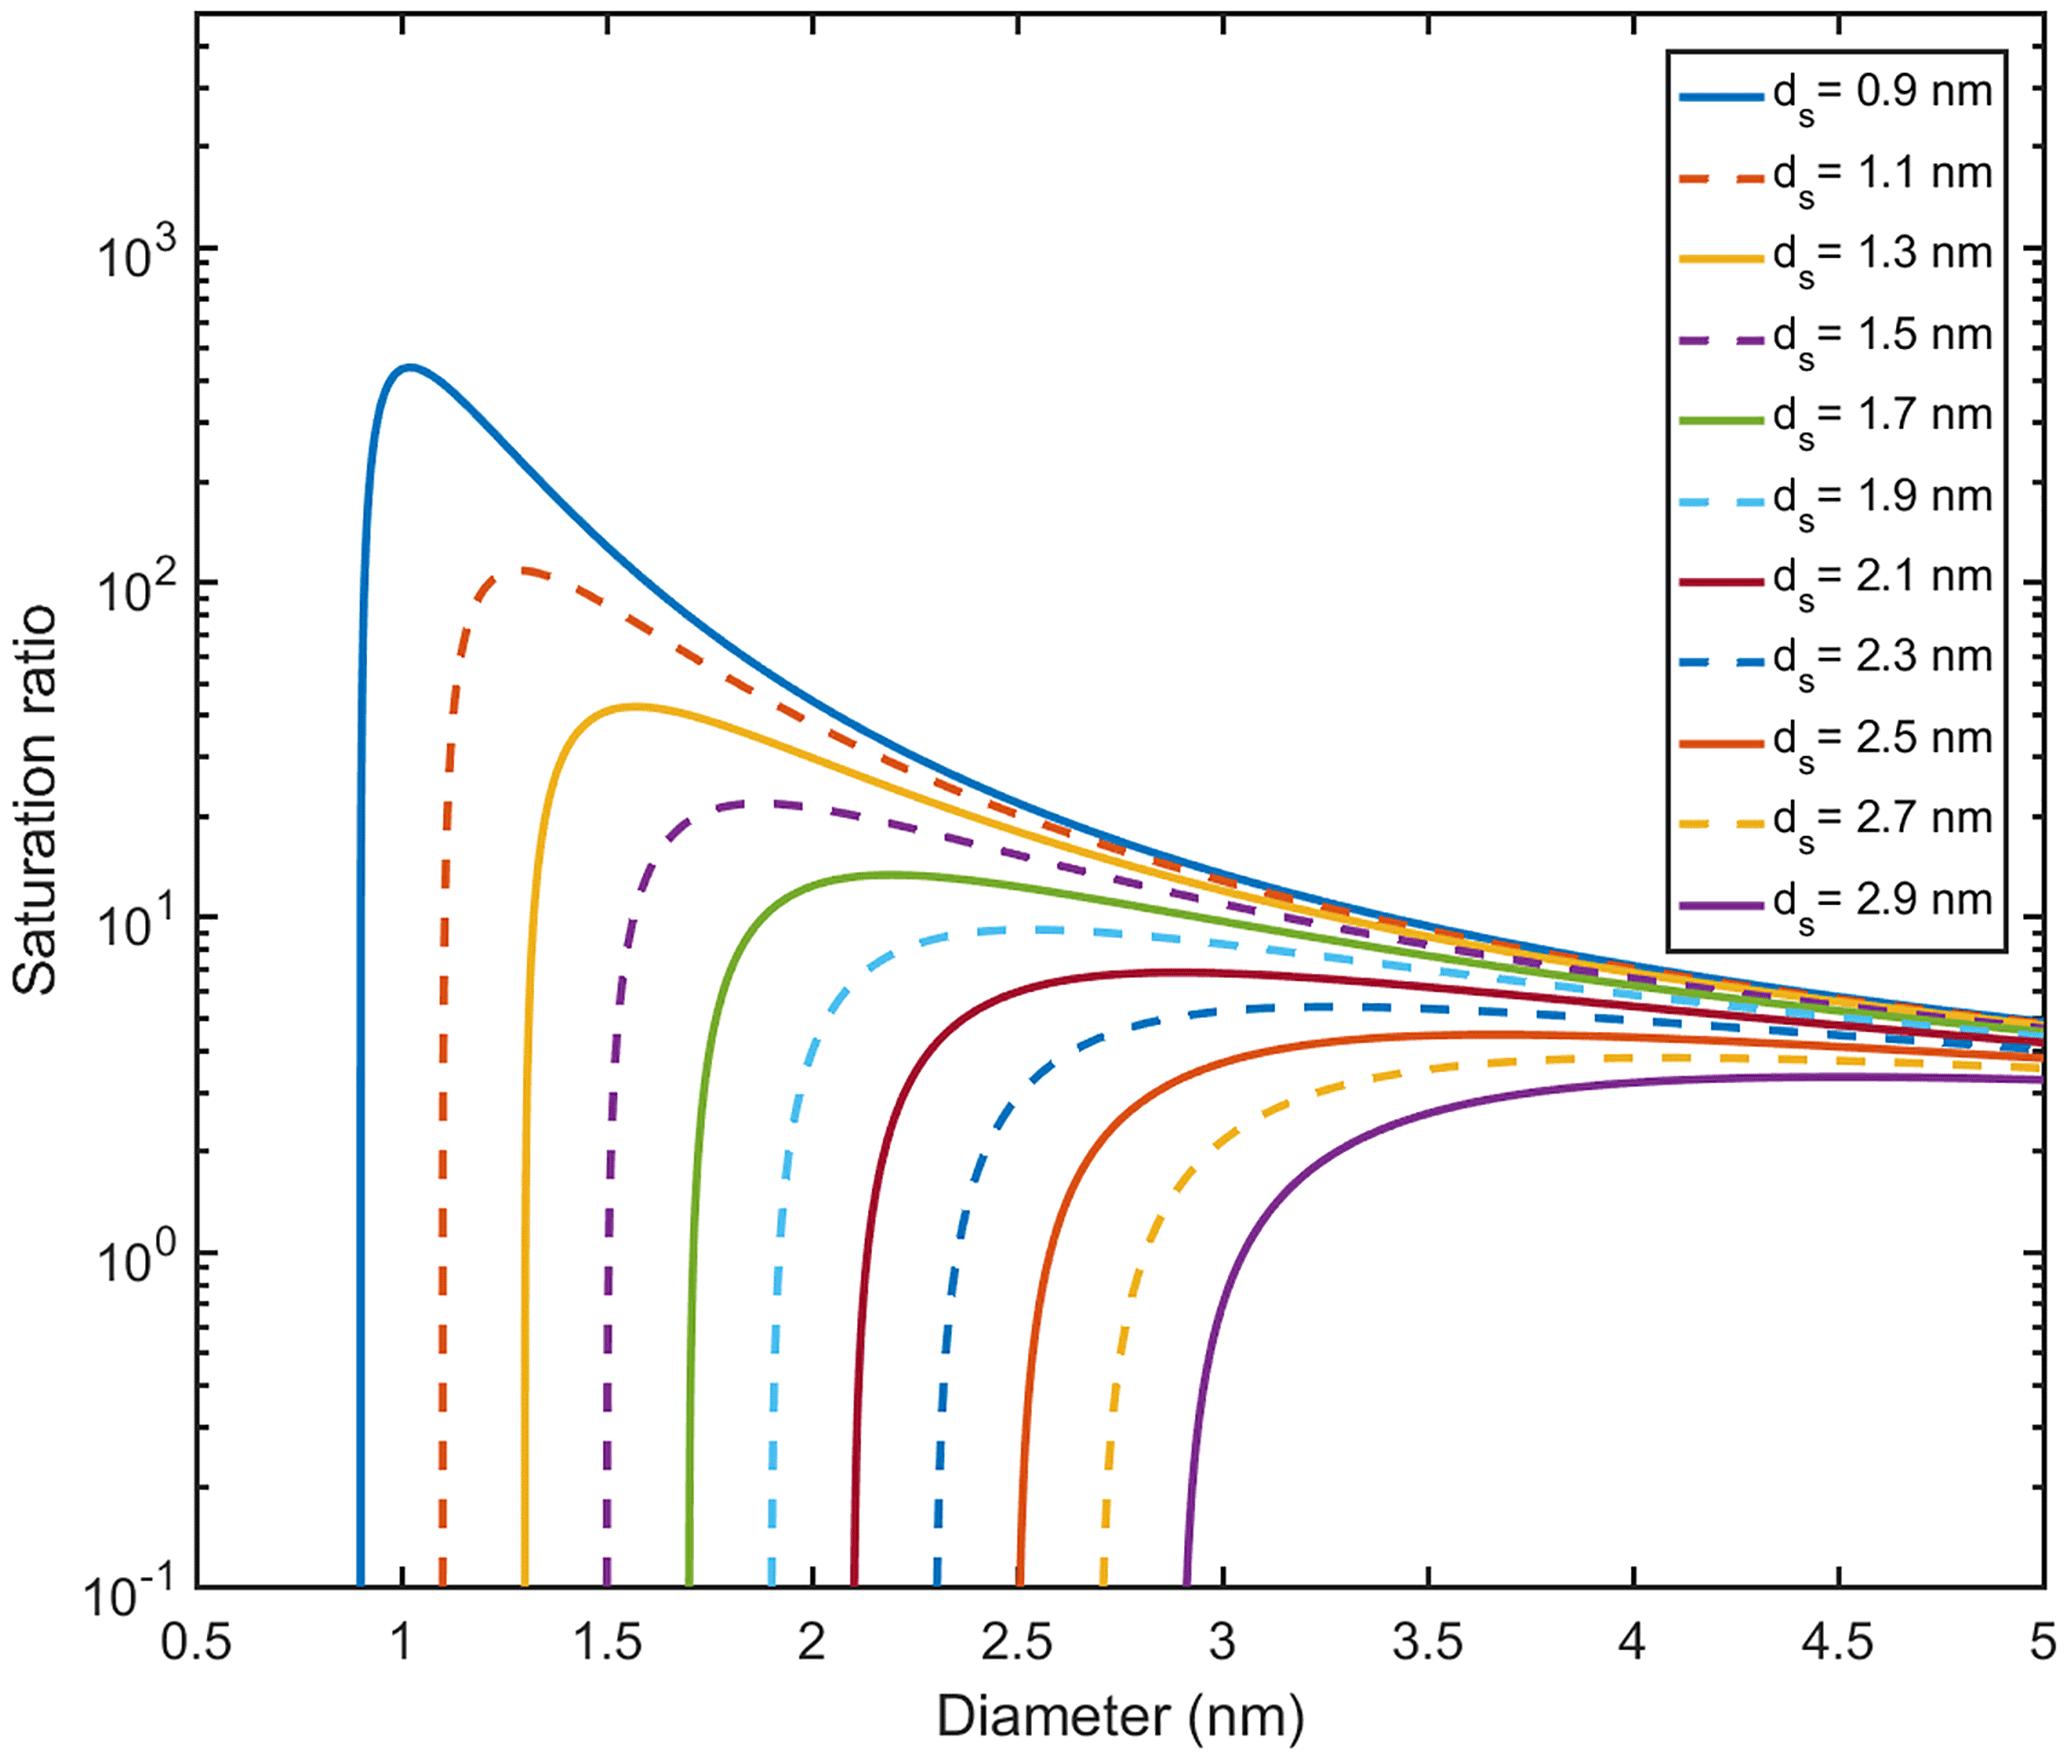 ACP - Exploring the potential of nano-Köhler theory to describe the